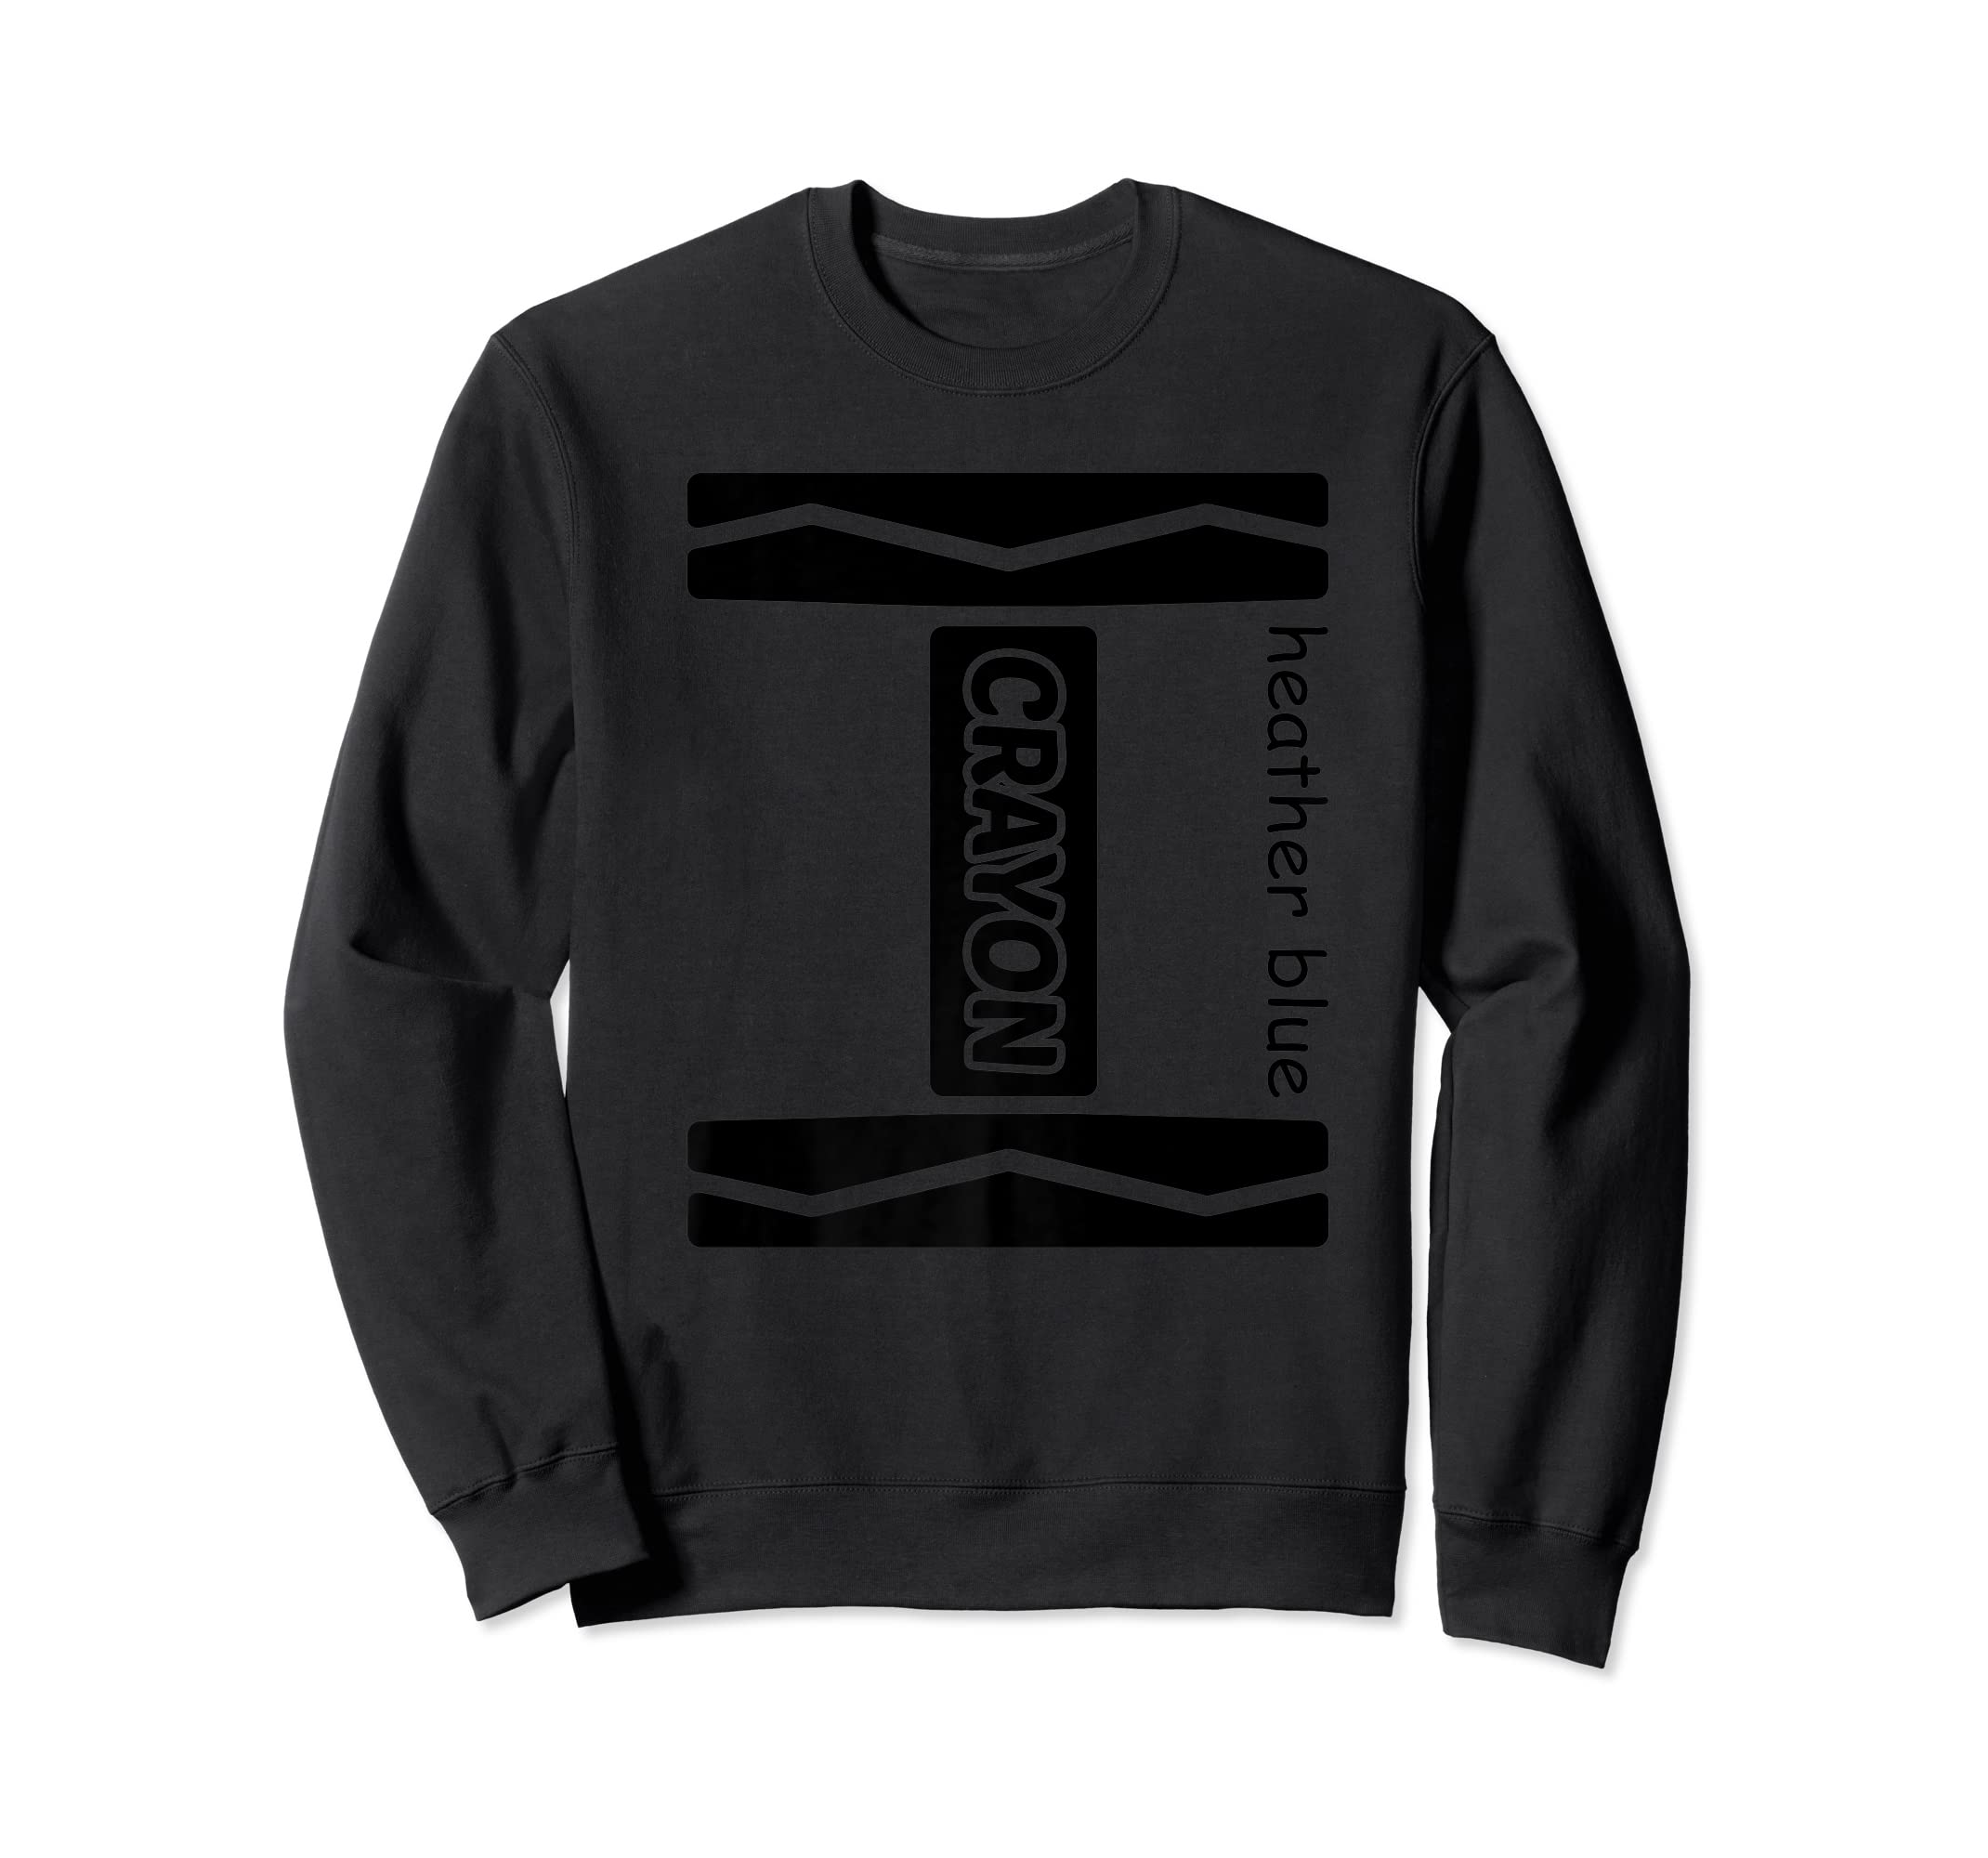 Heather Blue Crayon Halloween Costume Couple Friend Group Premium T-Shirt-Sweatshirt-Black